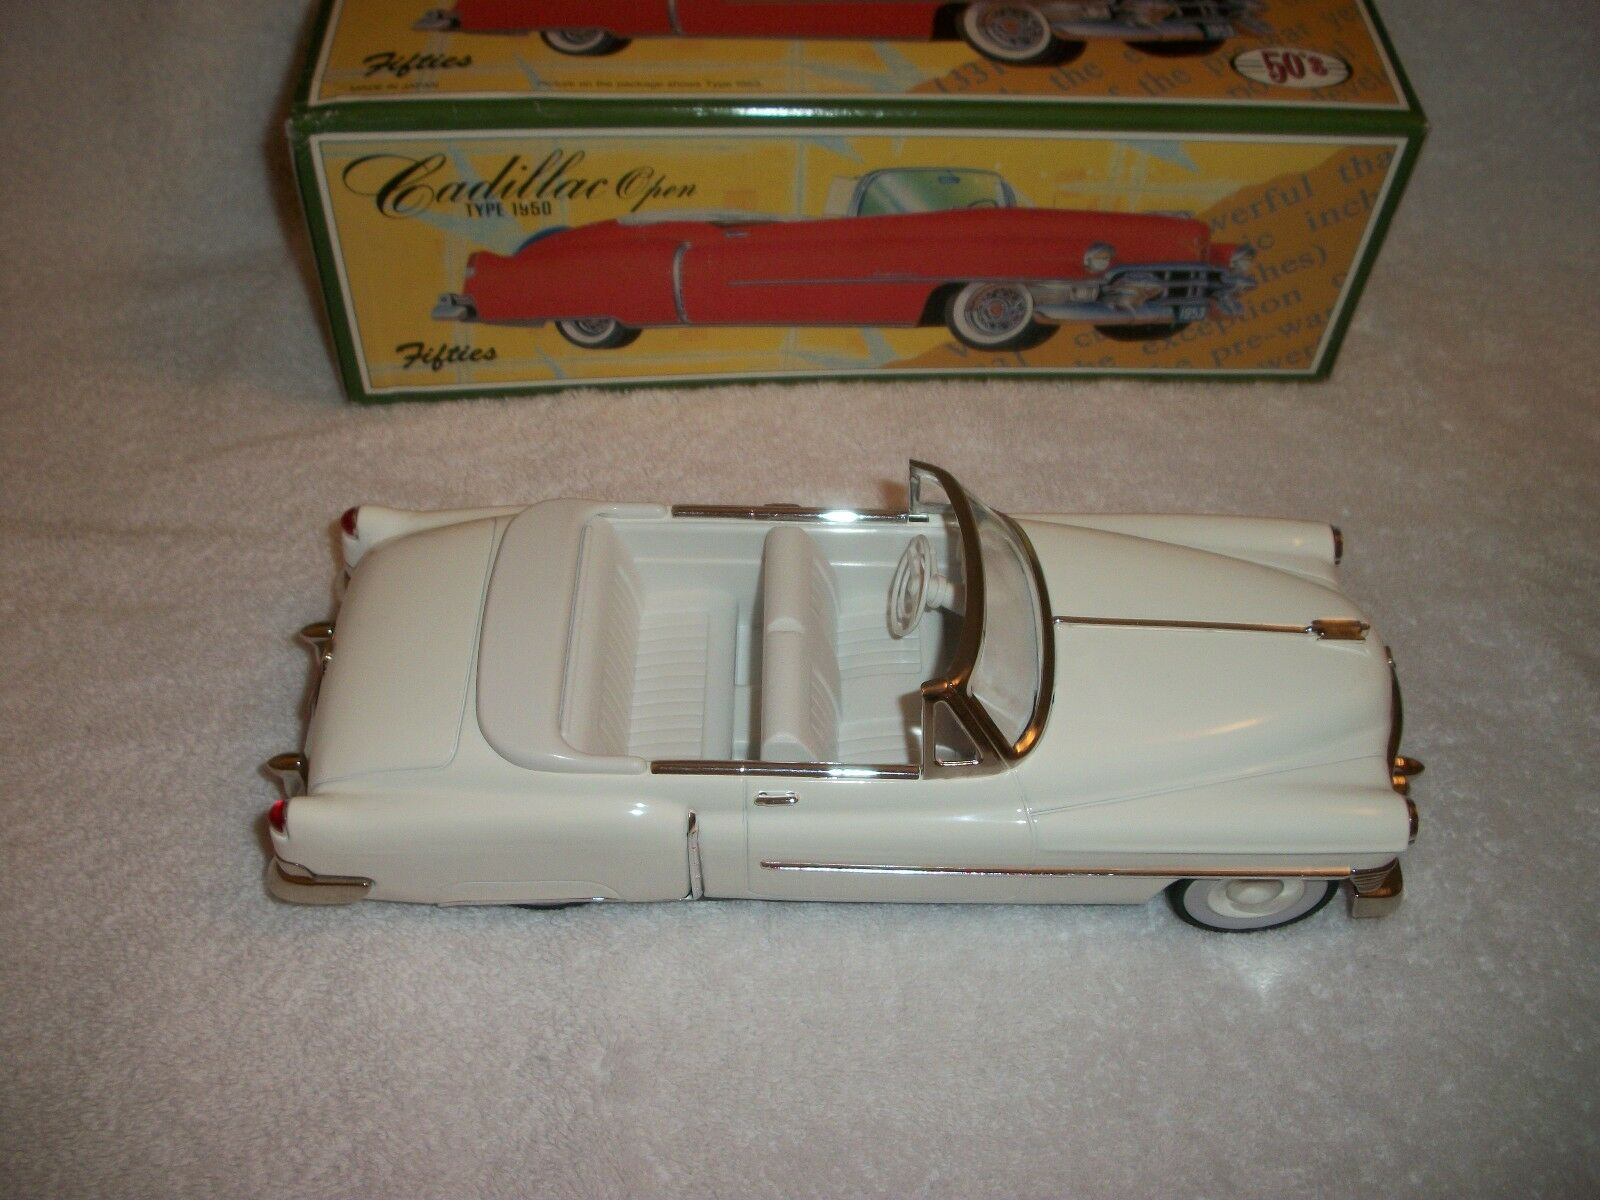 1950 - modell cadillac - metall